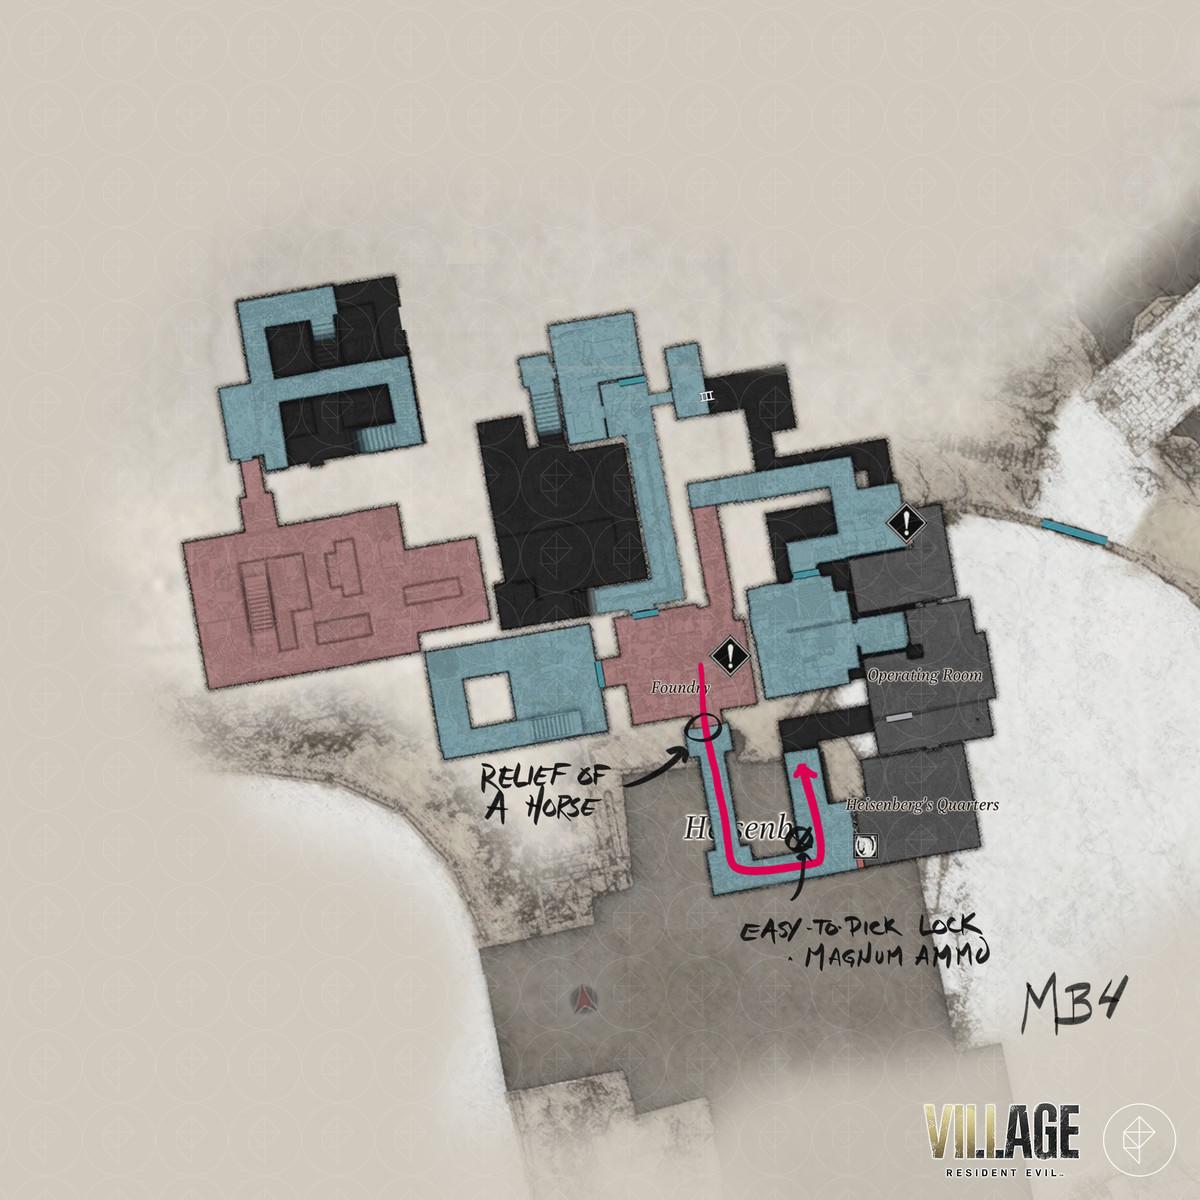 Resident Evil Village walkthrough part 14: Place the flasks and Heisenberg's Factory